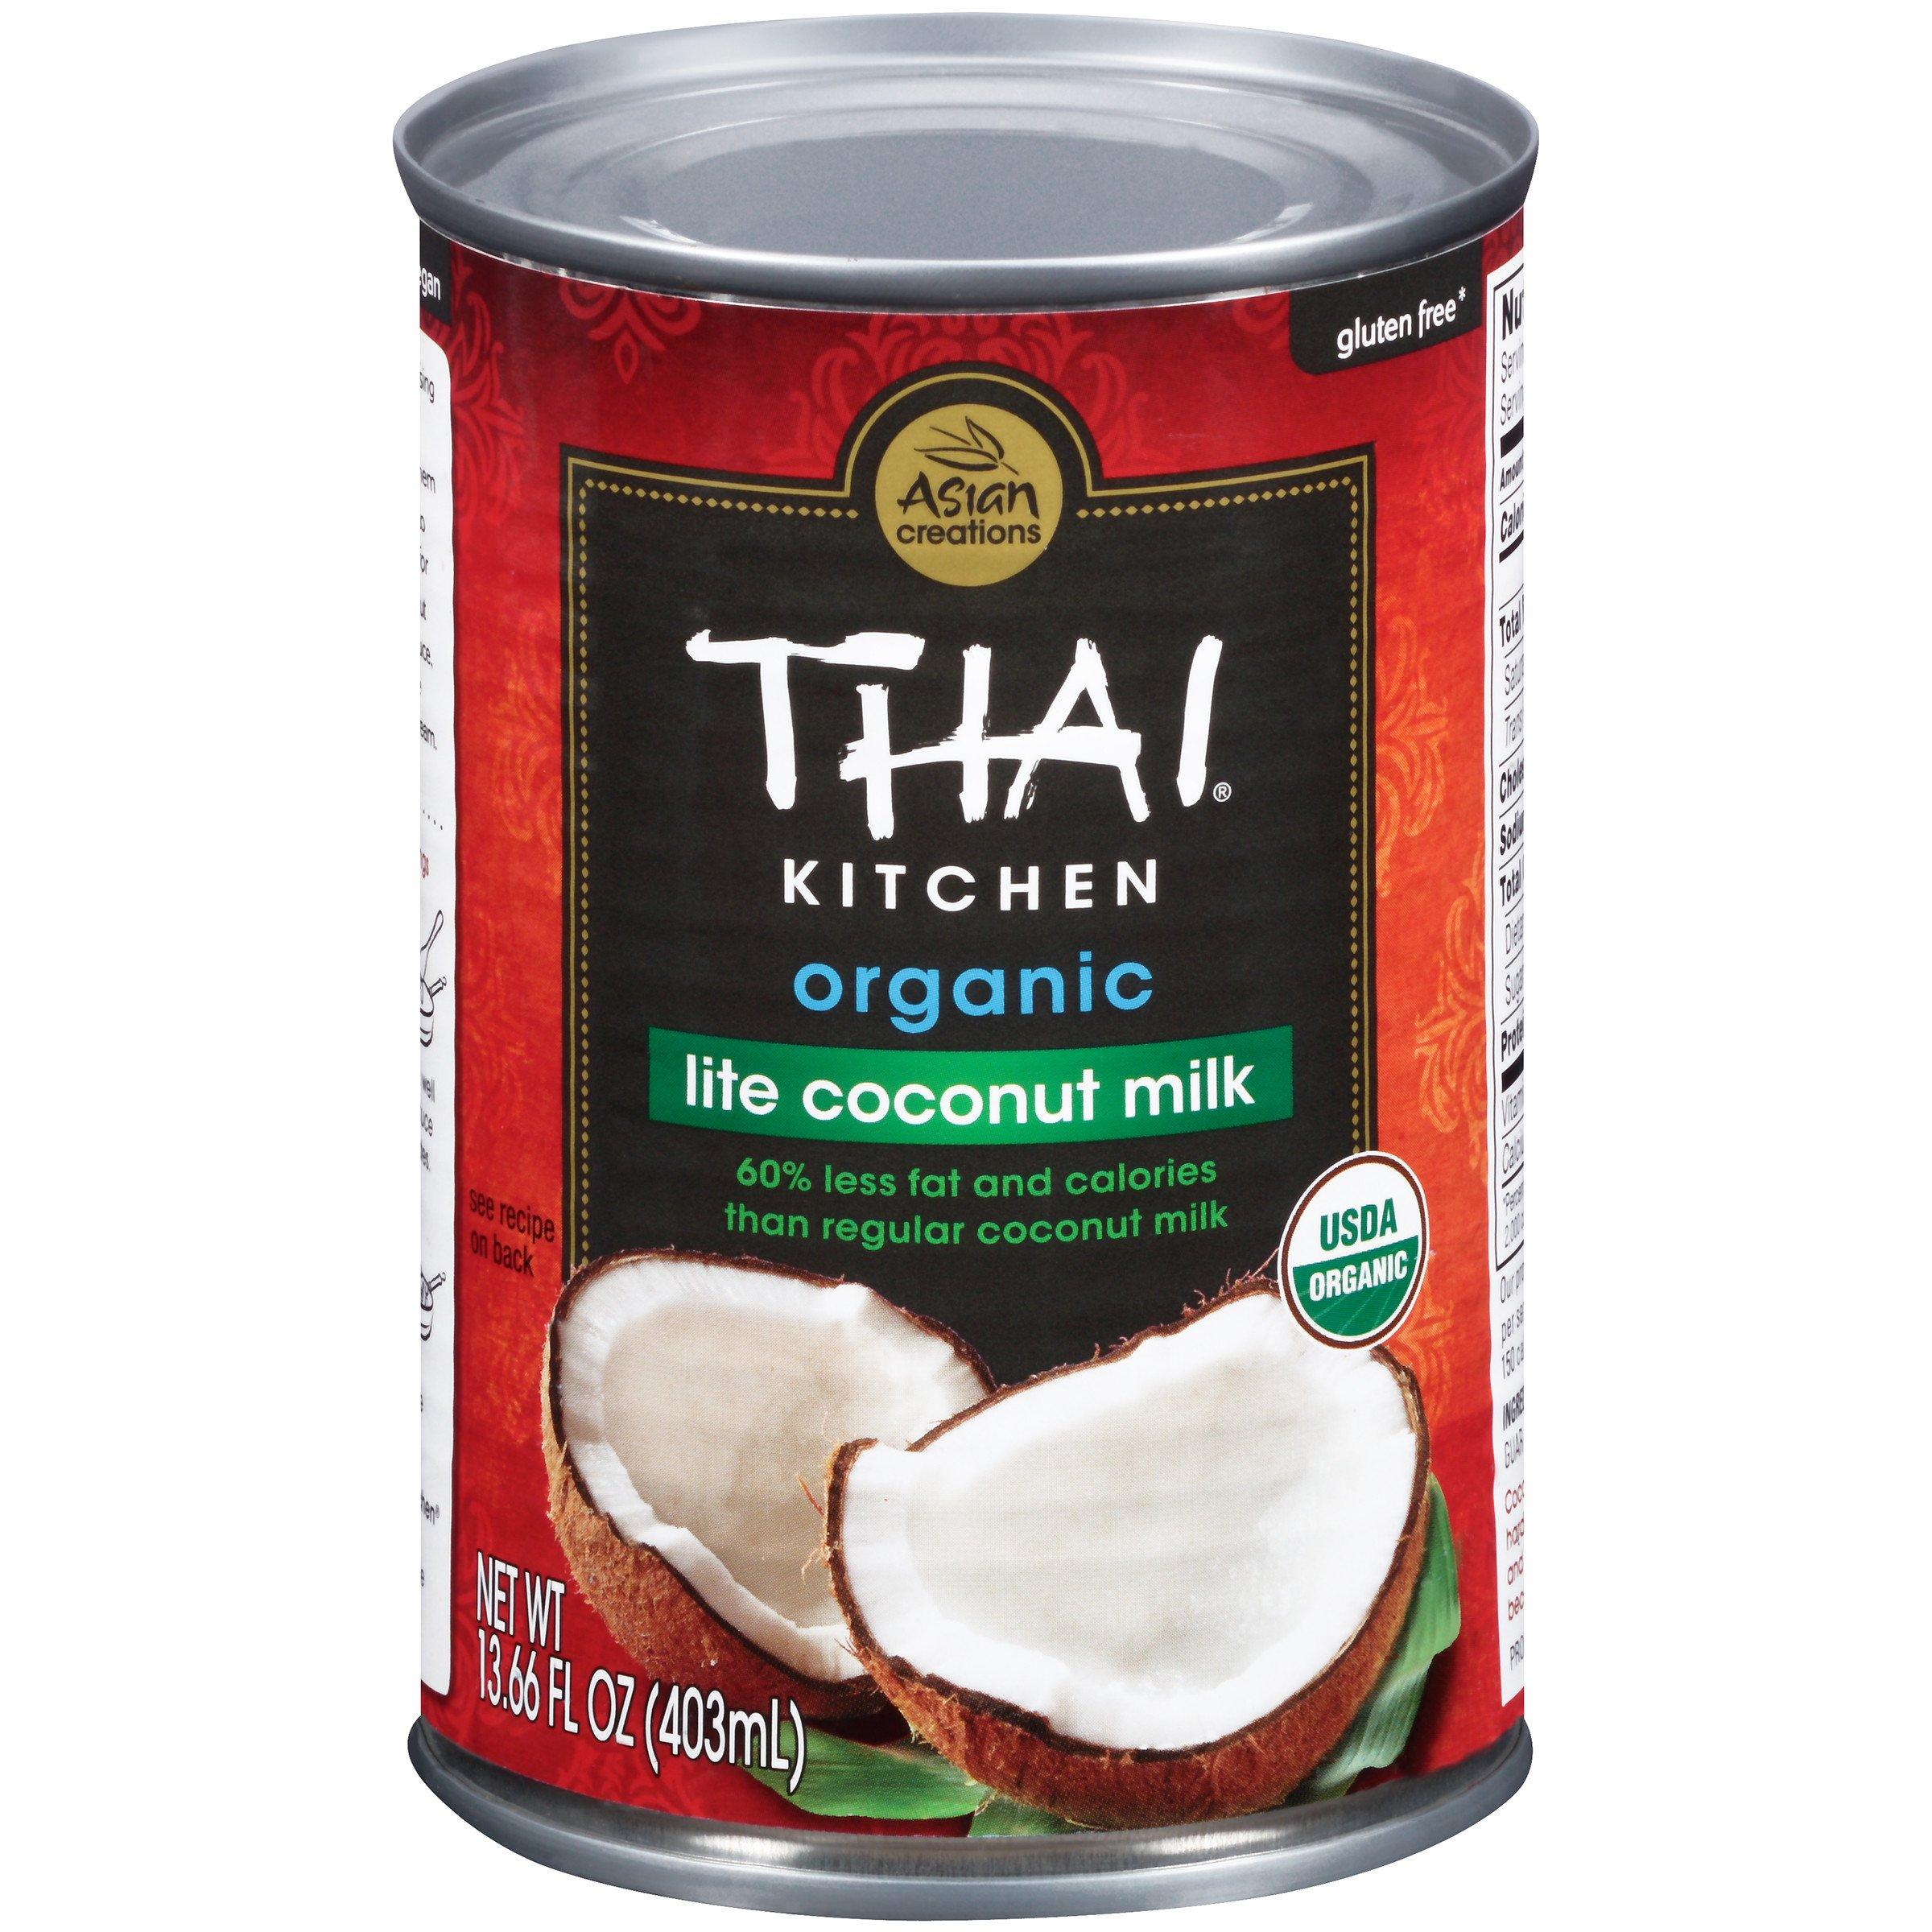 Thai Kitchen Organic Coconut Milk, 13.66 Fluid Ounce, (Pack of 12)